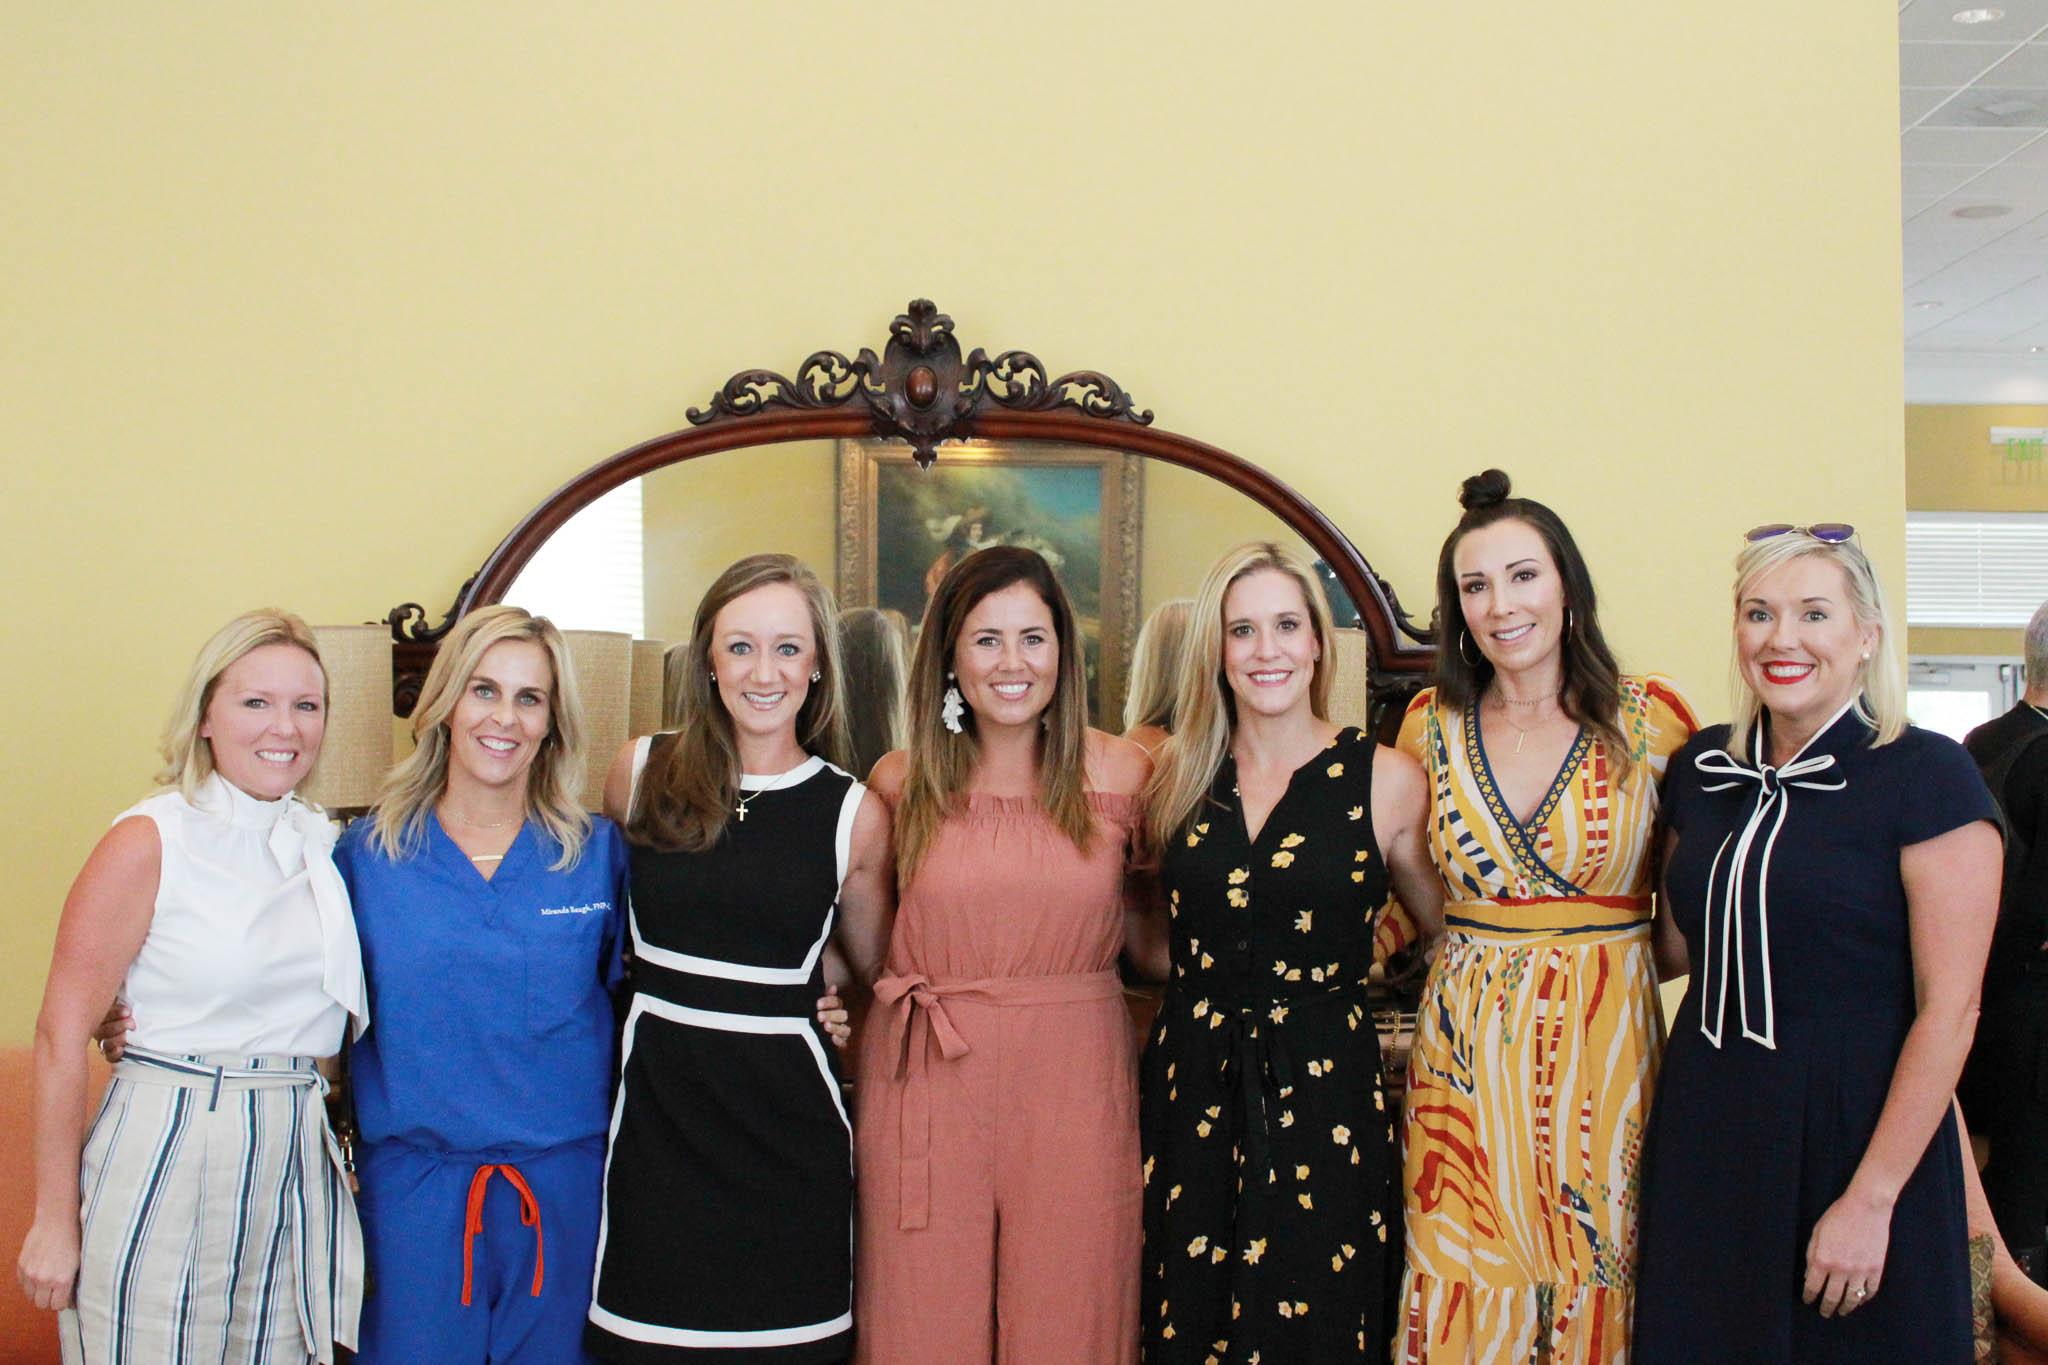 Danielle Patterson, Miranda Baugh, Clara Tengwall, Jessica Rich, Megan Menefee, Mindi Pruett and Cassy Meisenheimer